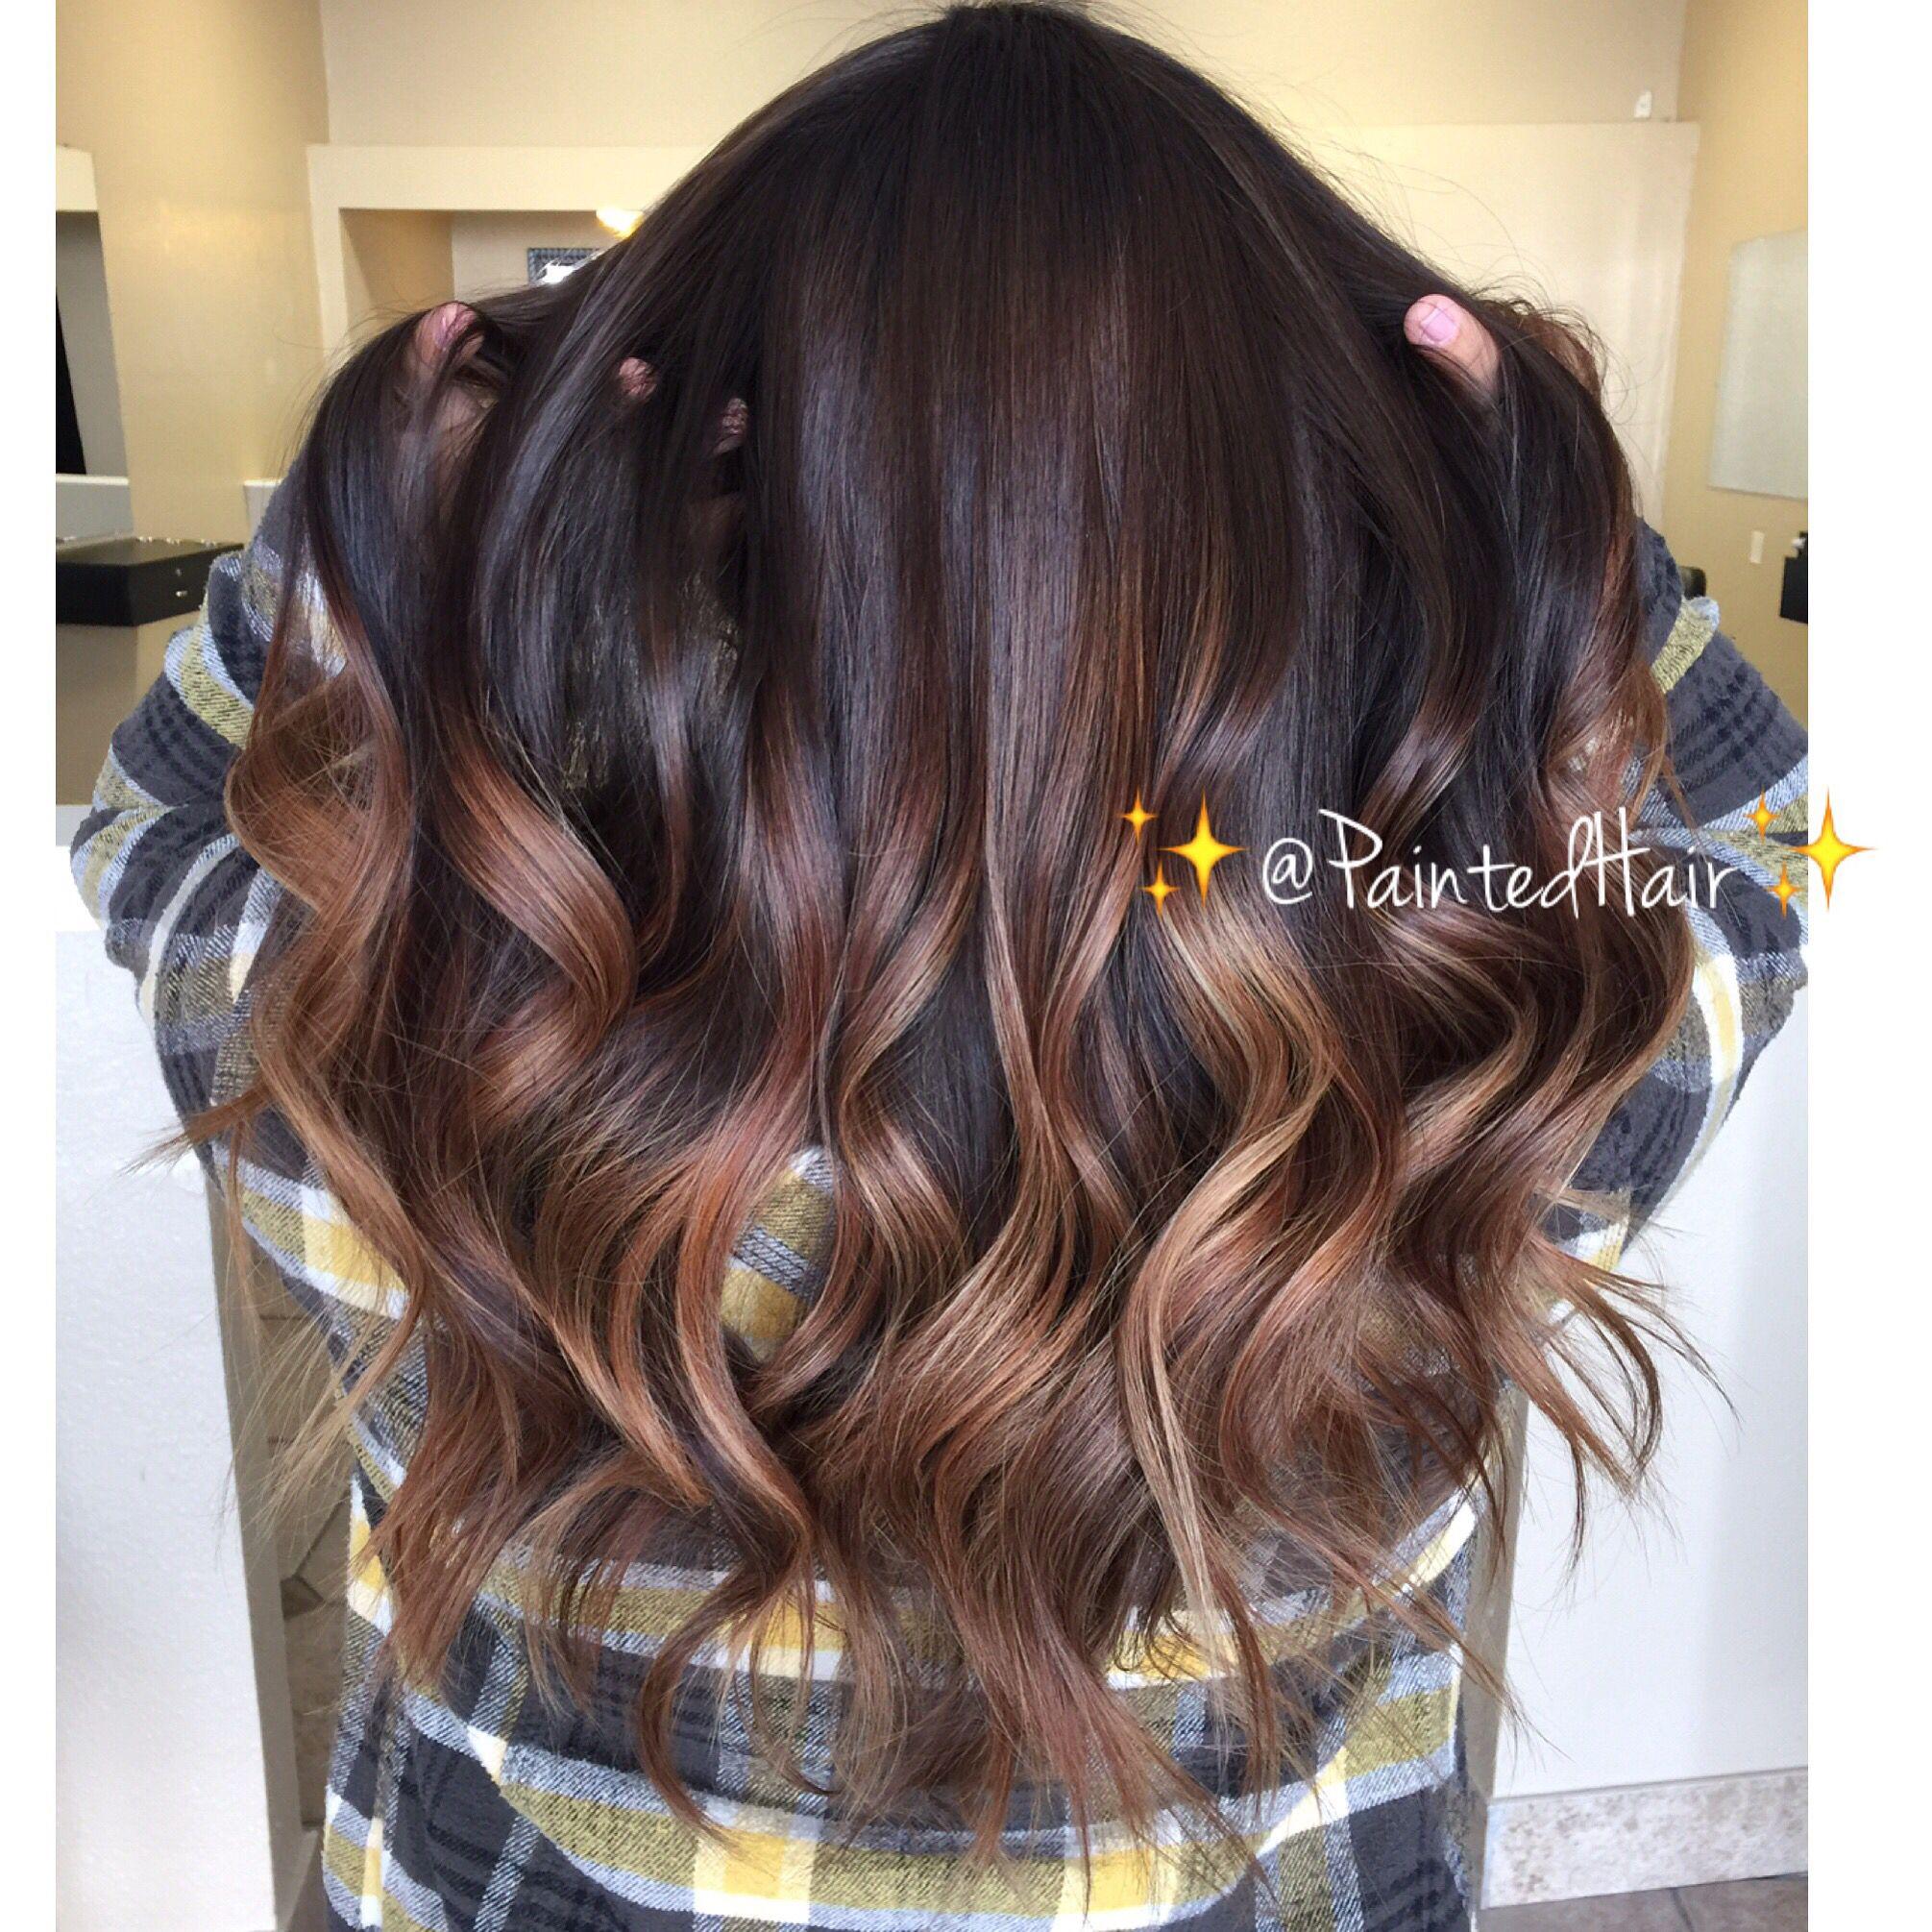 11 Painted Hair Ideas Hair Hair Painting Long Hair Styles